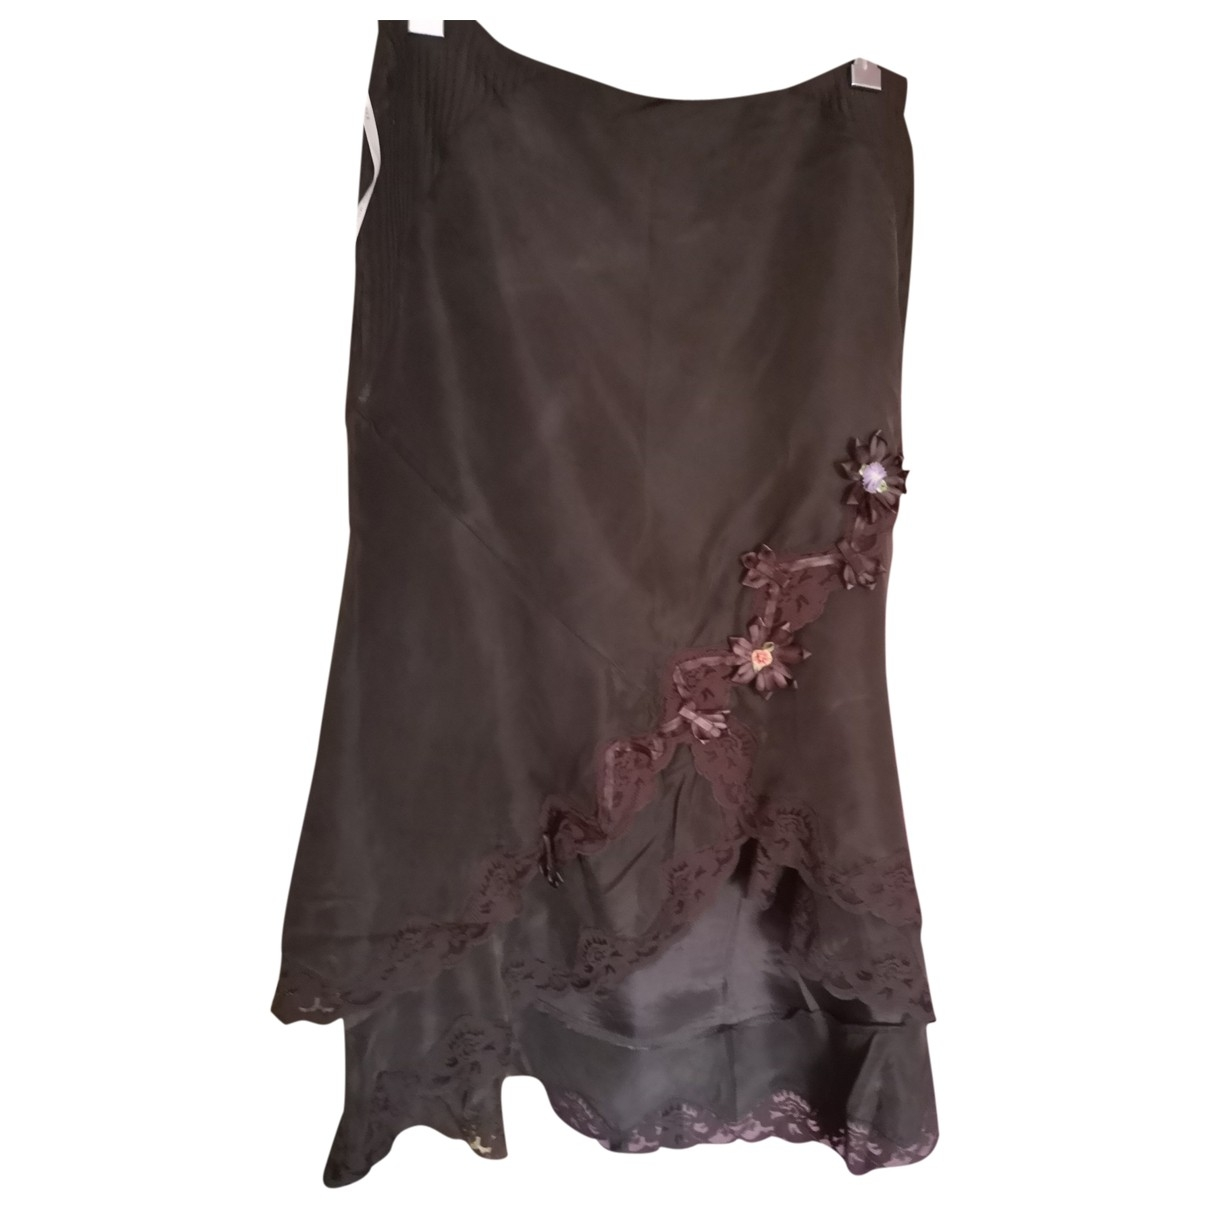 Karen Millen - Jupe   pour femme en soie - marron